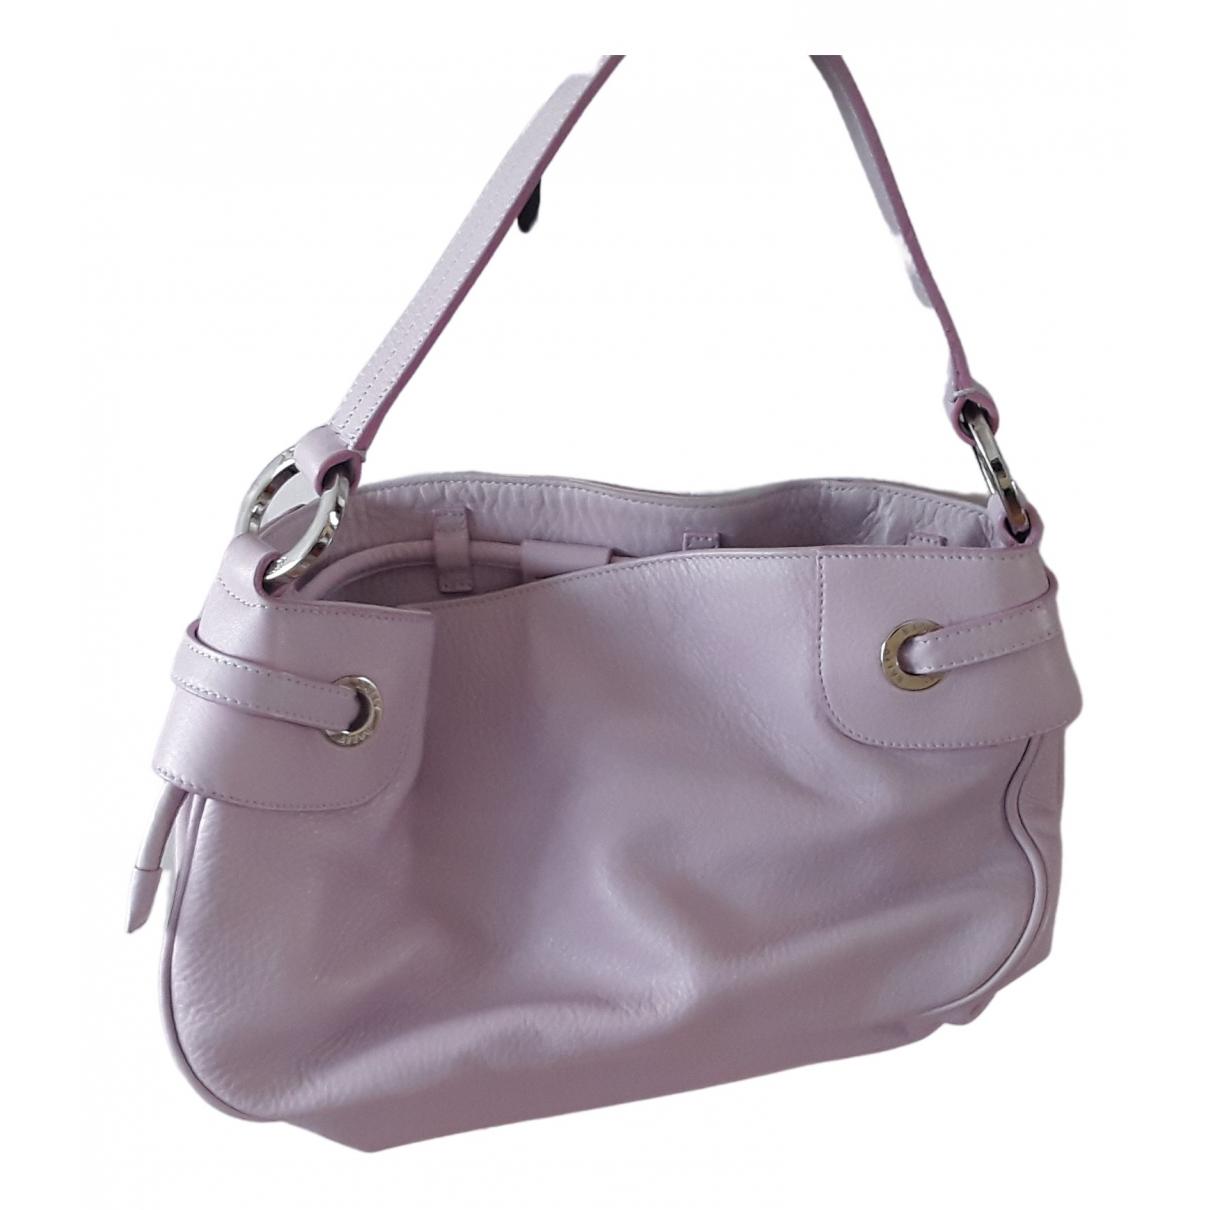 Bally \N Pink Leather handbag for Women \N